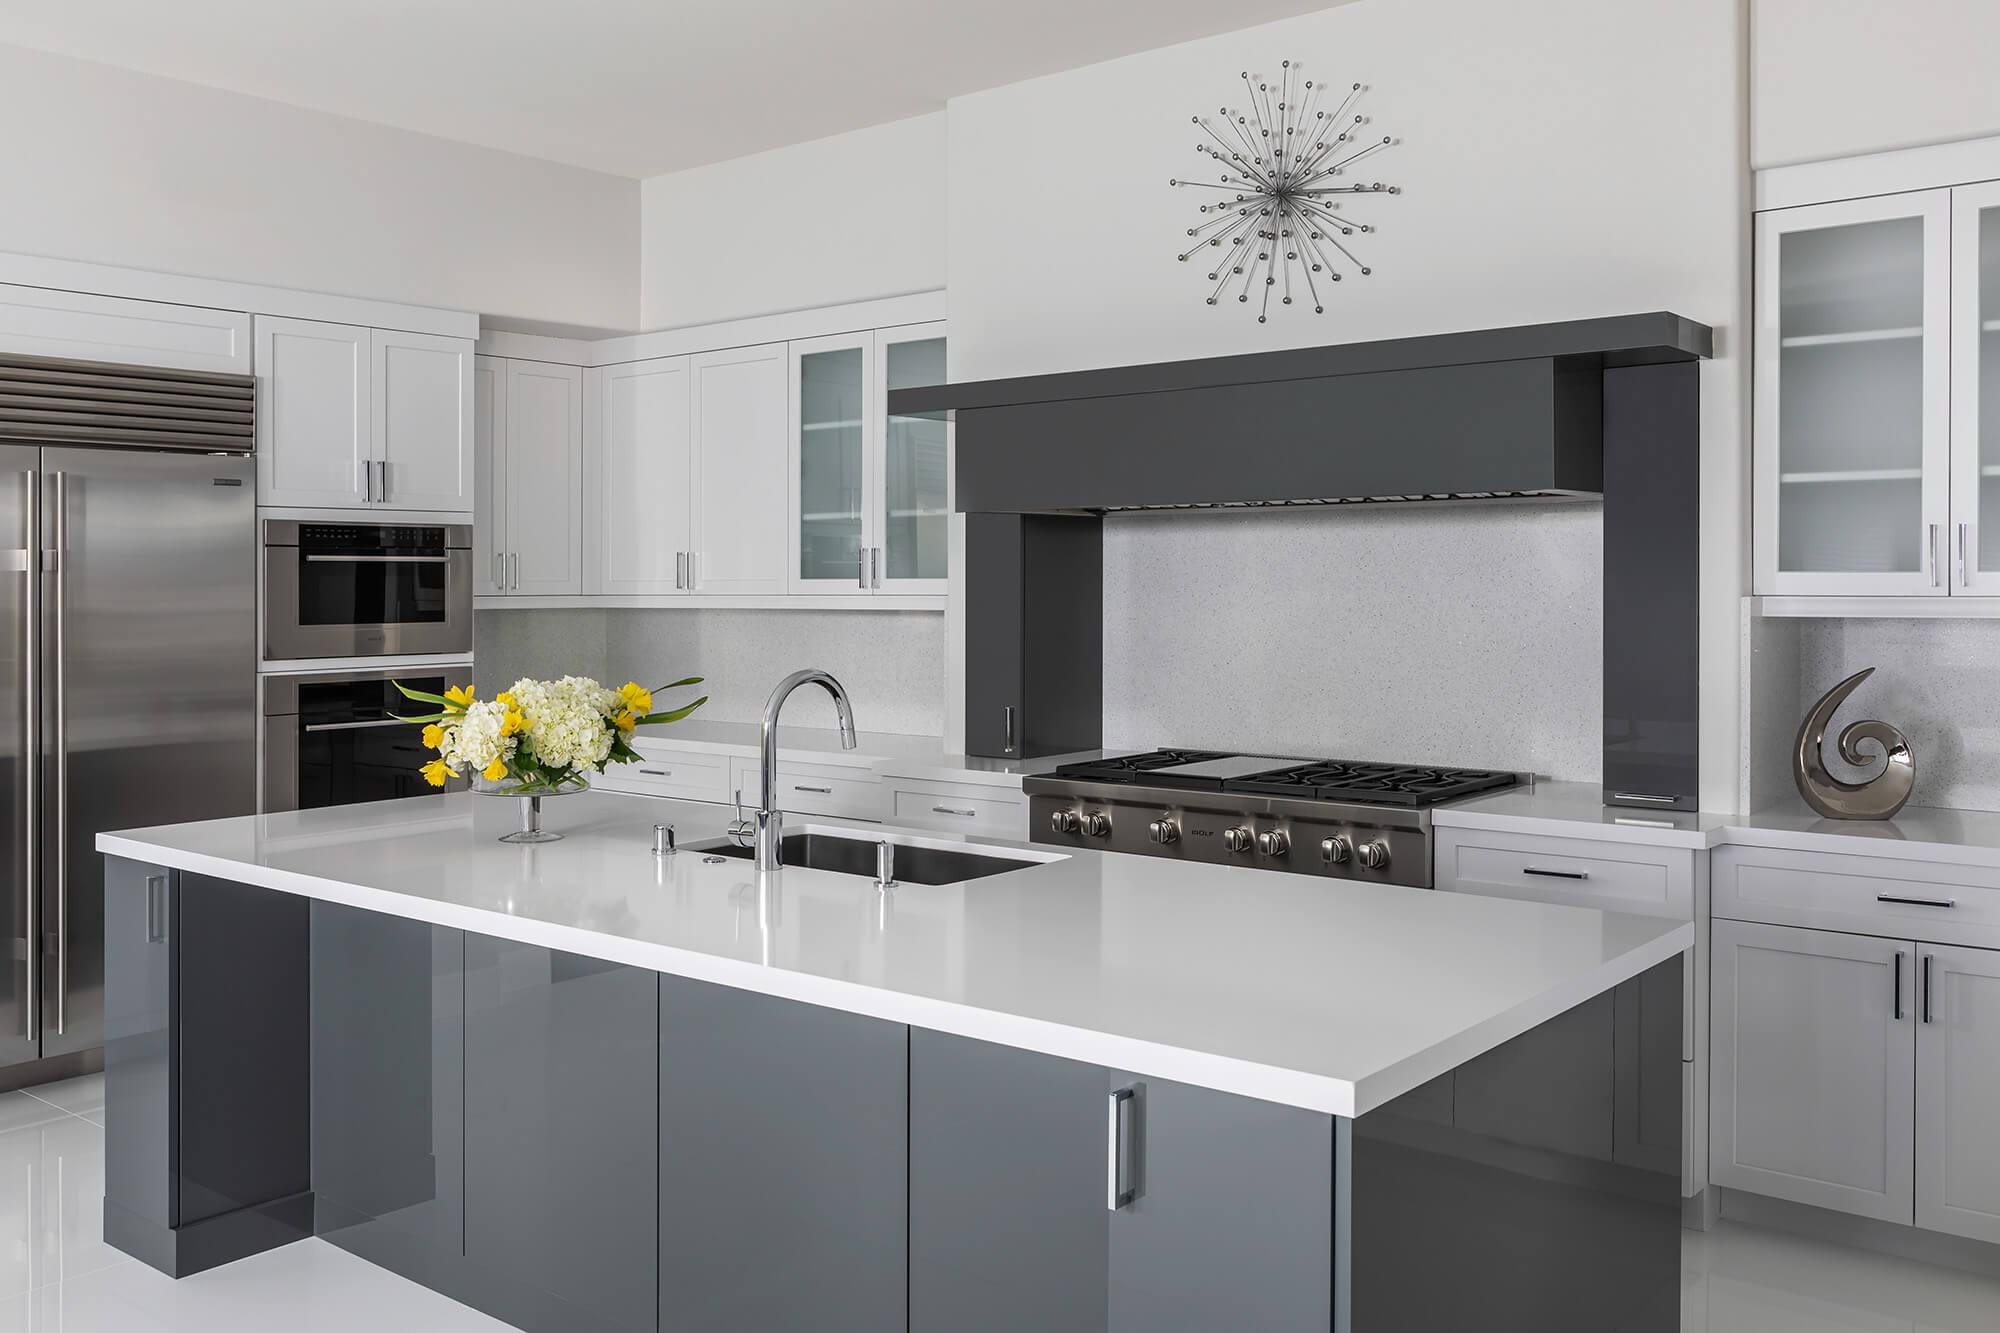 modern custom built-in cabinets make this kitchen shine.